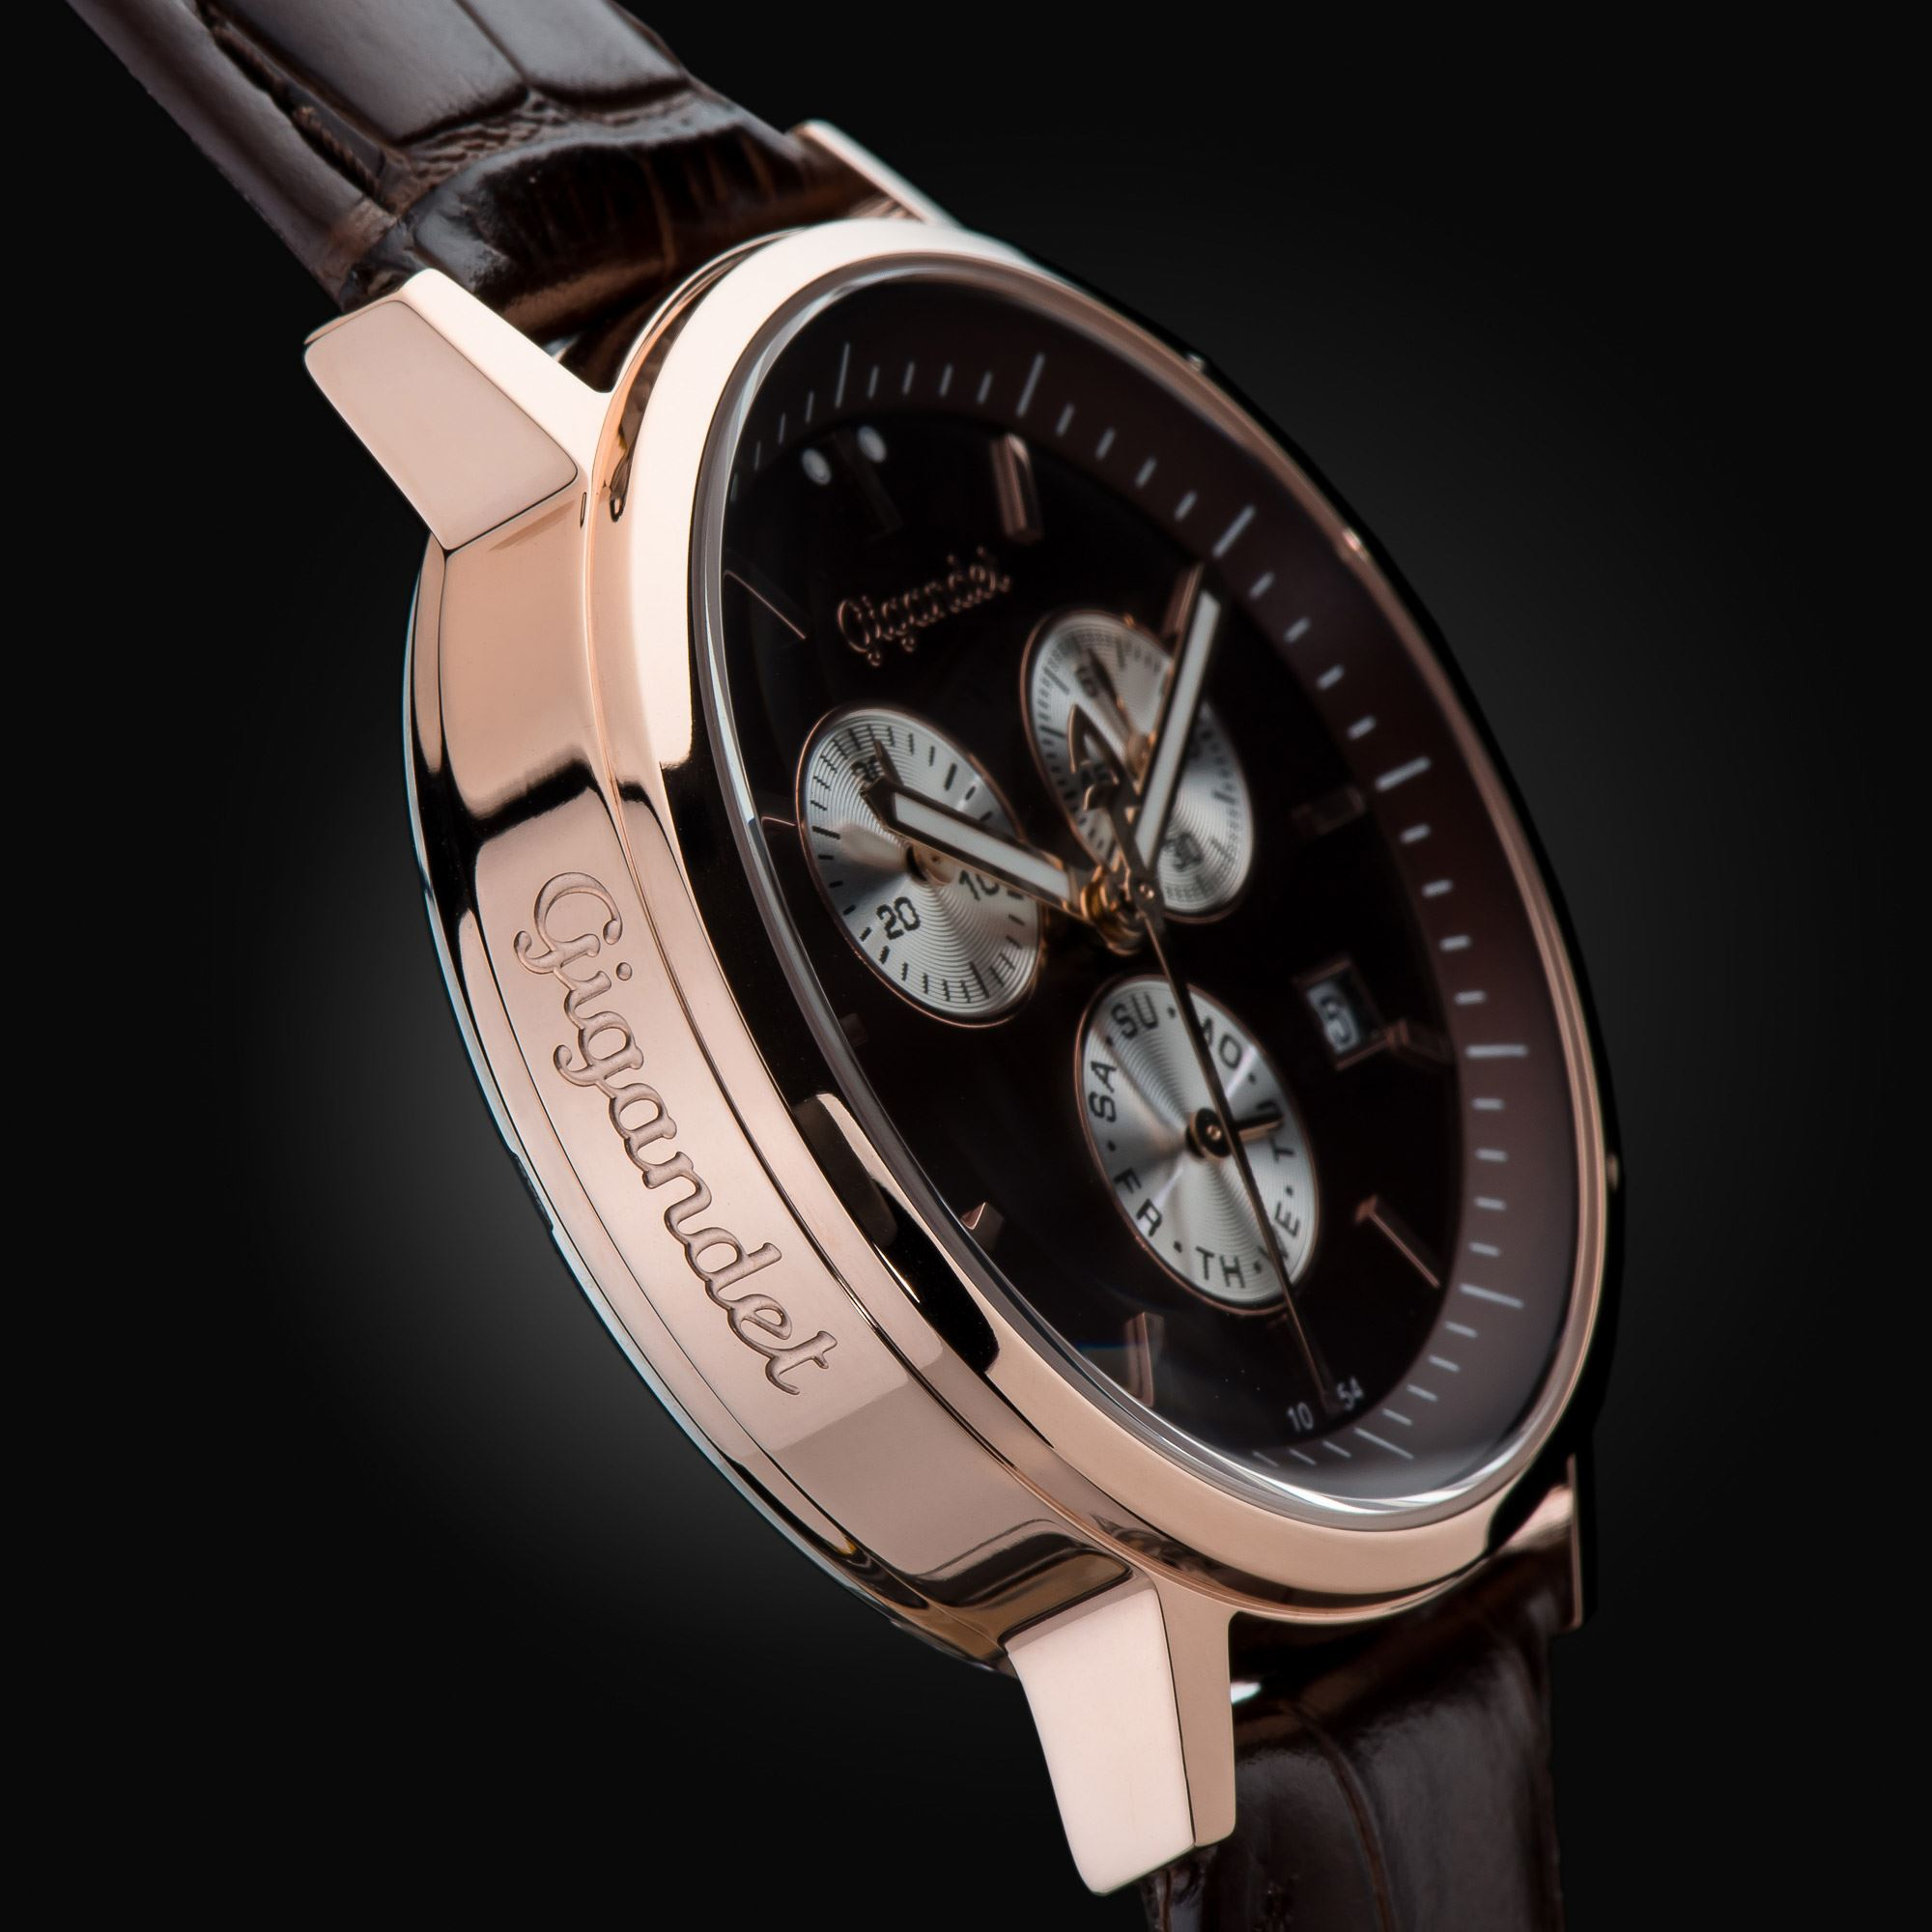 Gigandet classico uhr chronograph datum lederarmband braun for Ebay classico